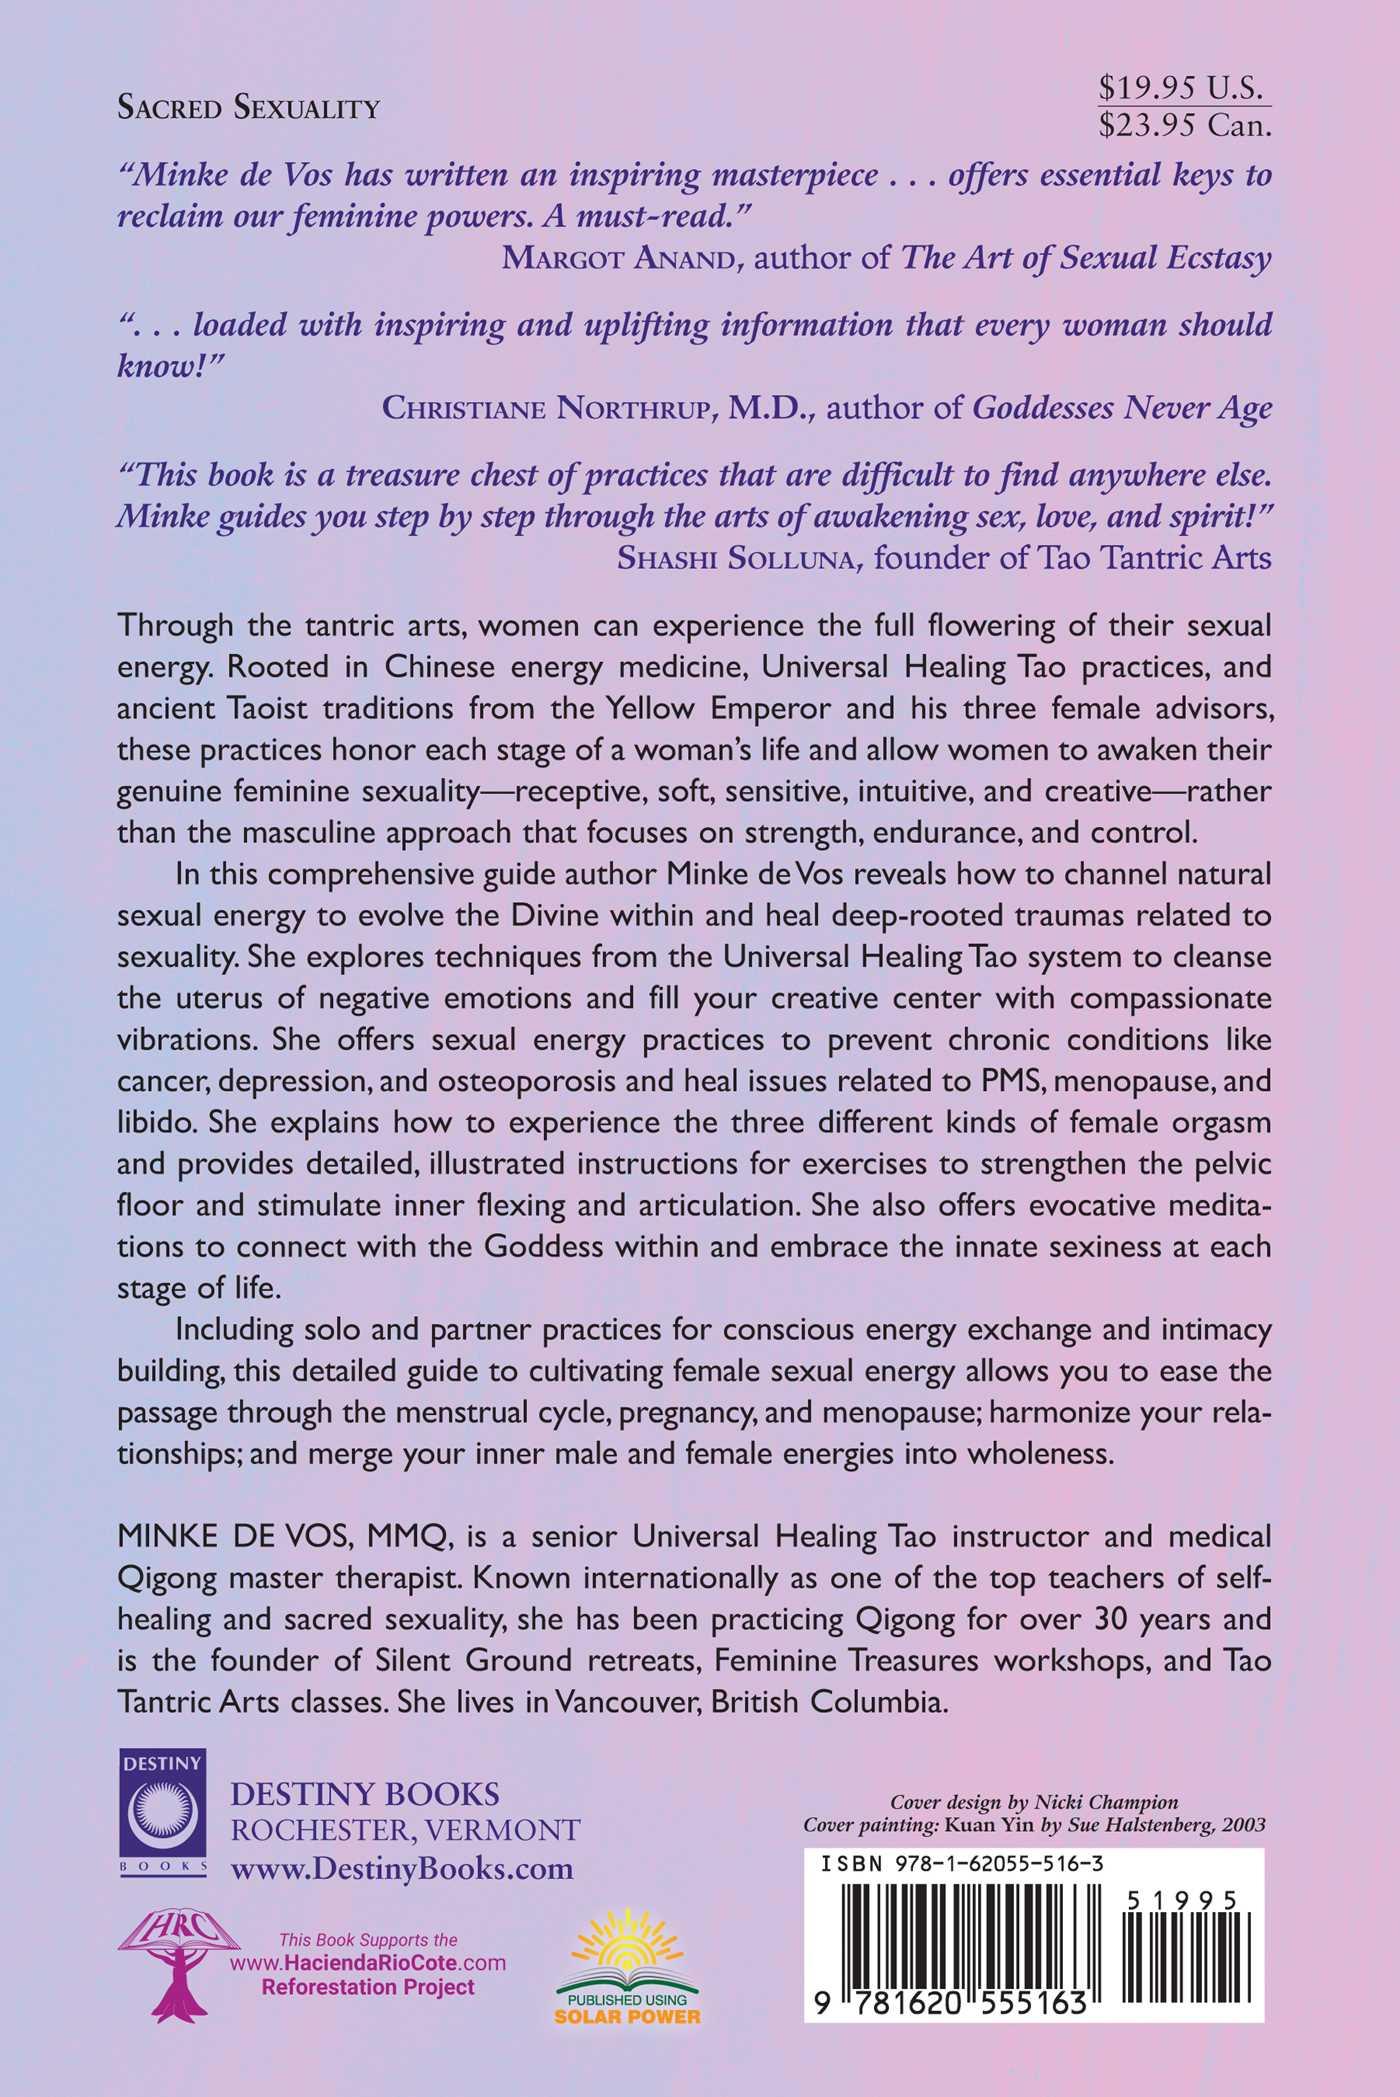 Tao Tantric Arts For Women Book By Minke De Vos Mantak Chia Solar Wiring Books